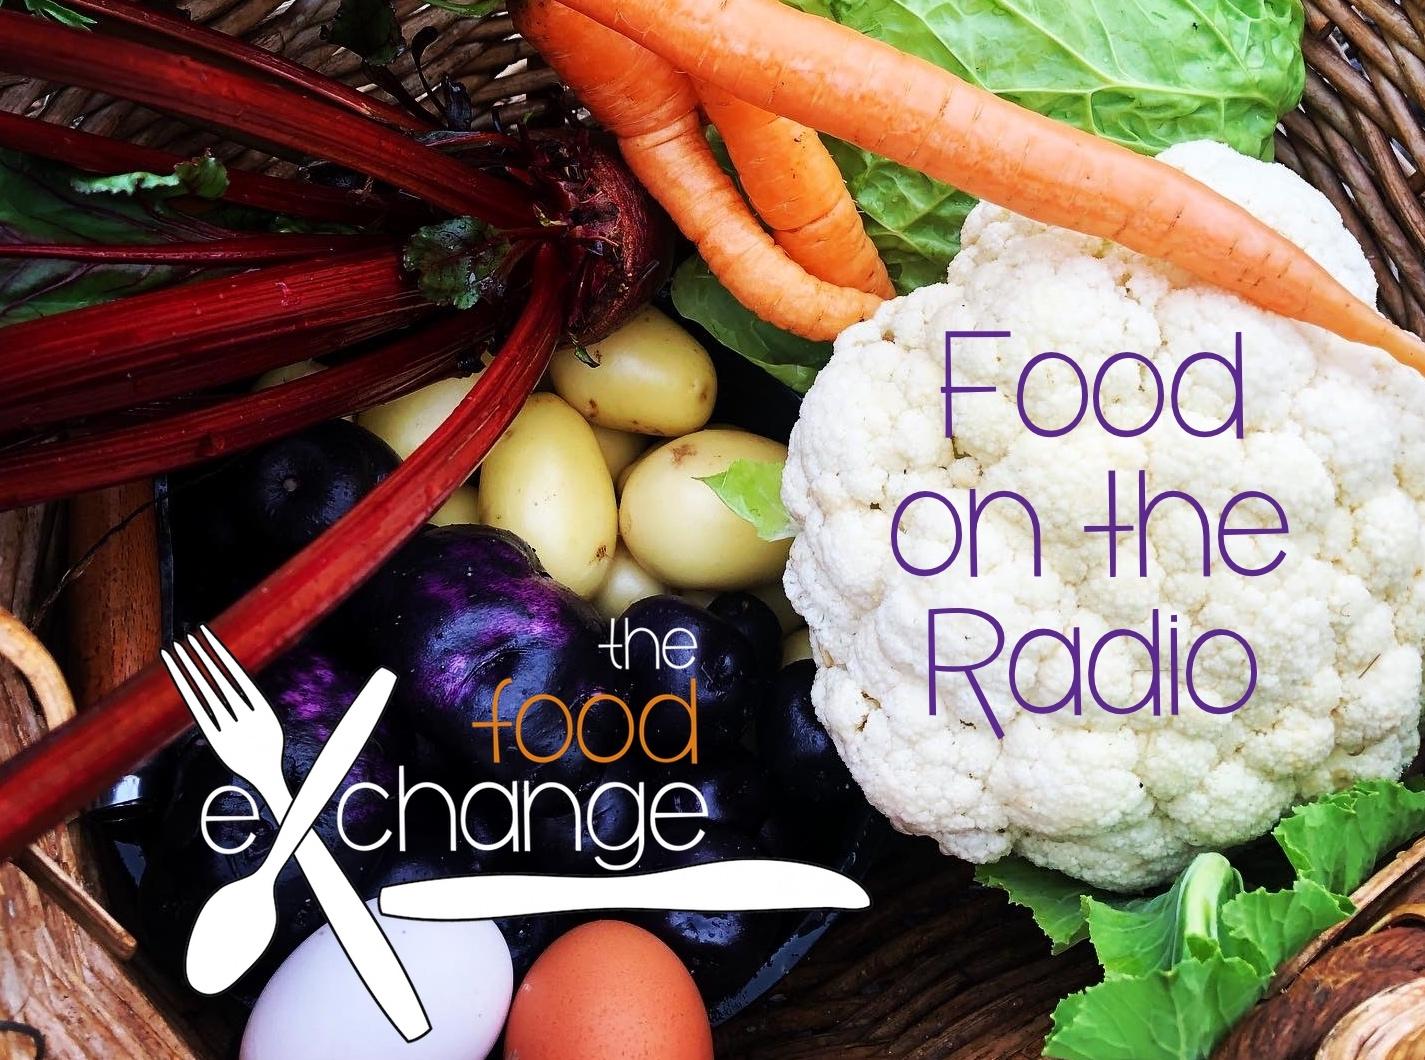 the food eXchange with Cynthia Lim on Seymour FM